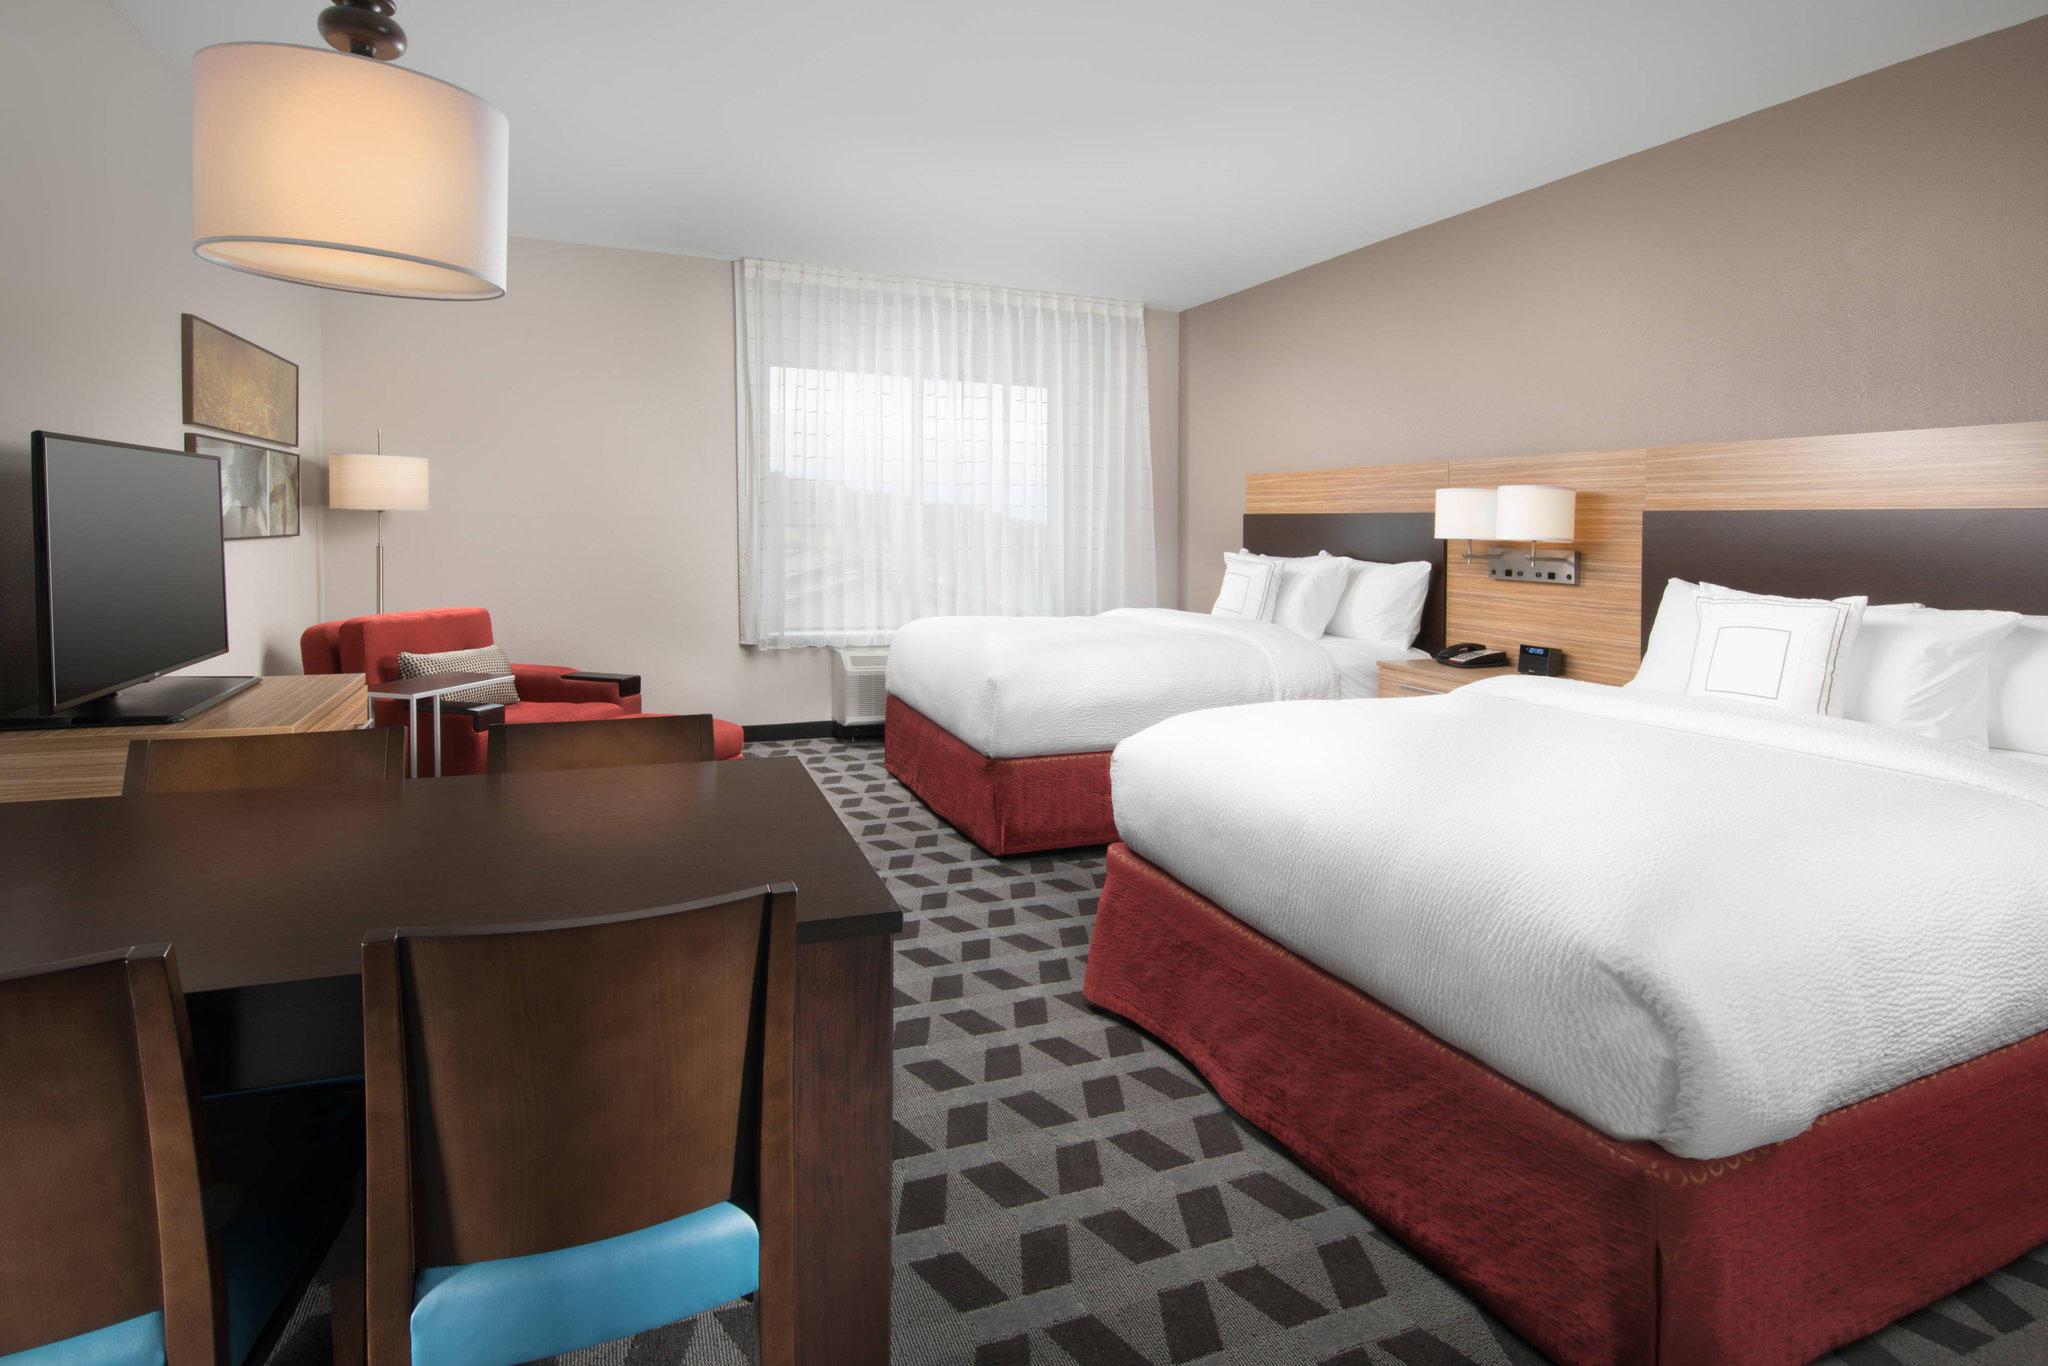 TownePlace Suites by Marriott Nashville Smyrna